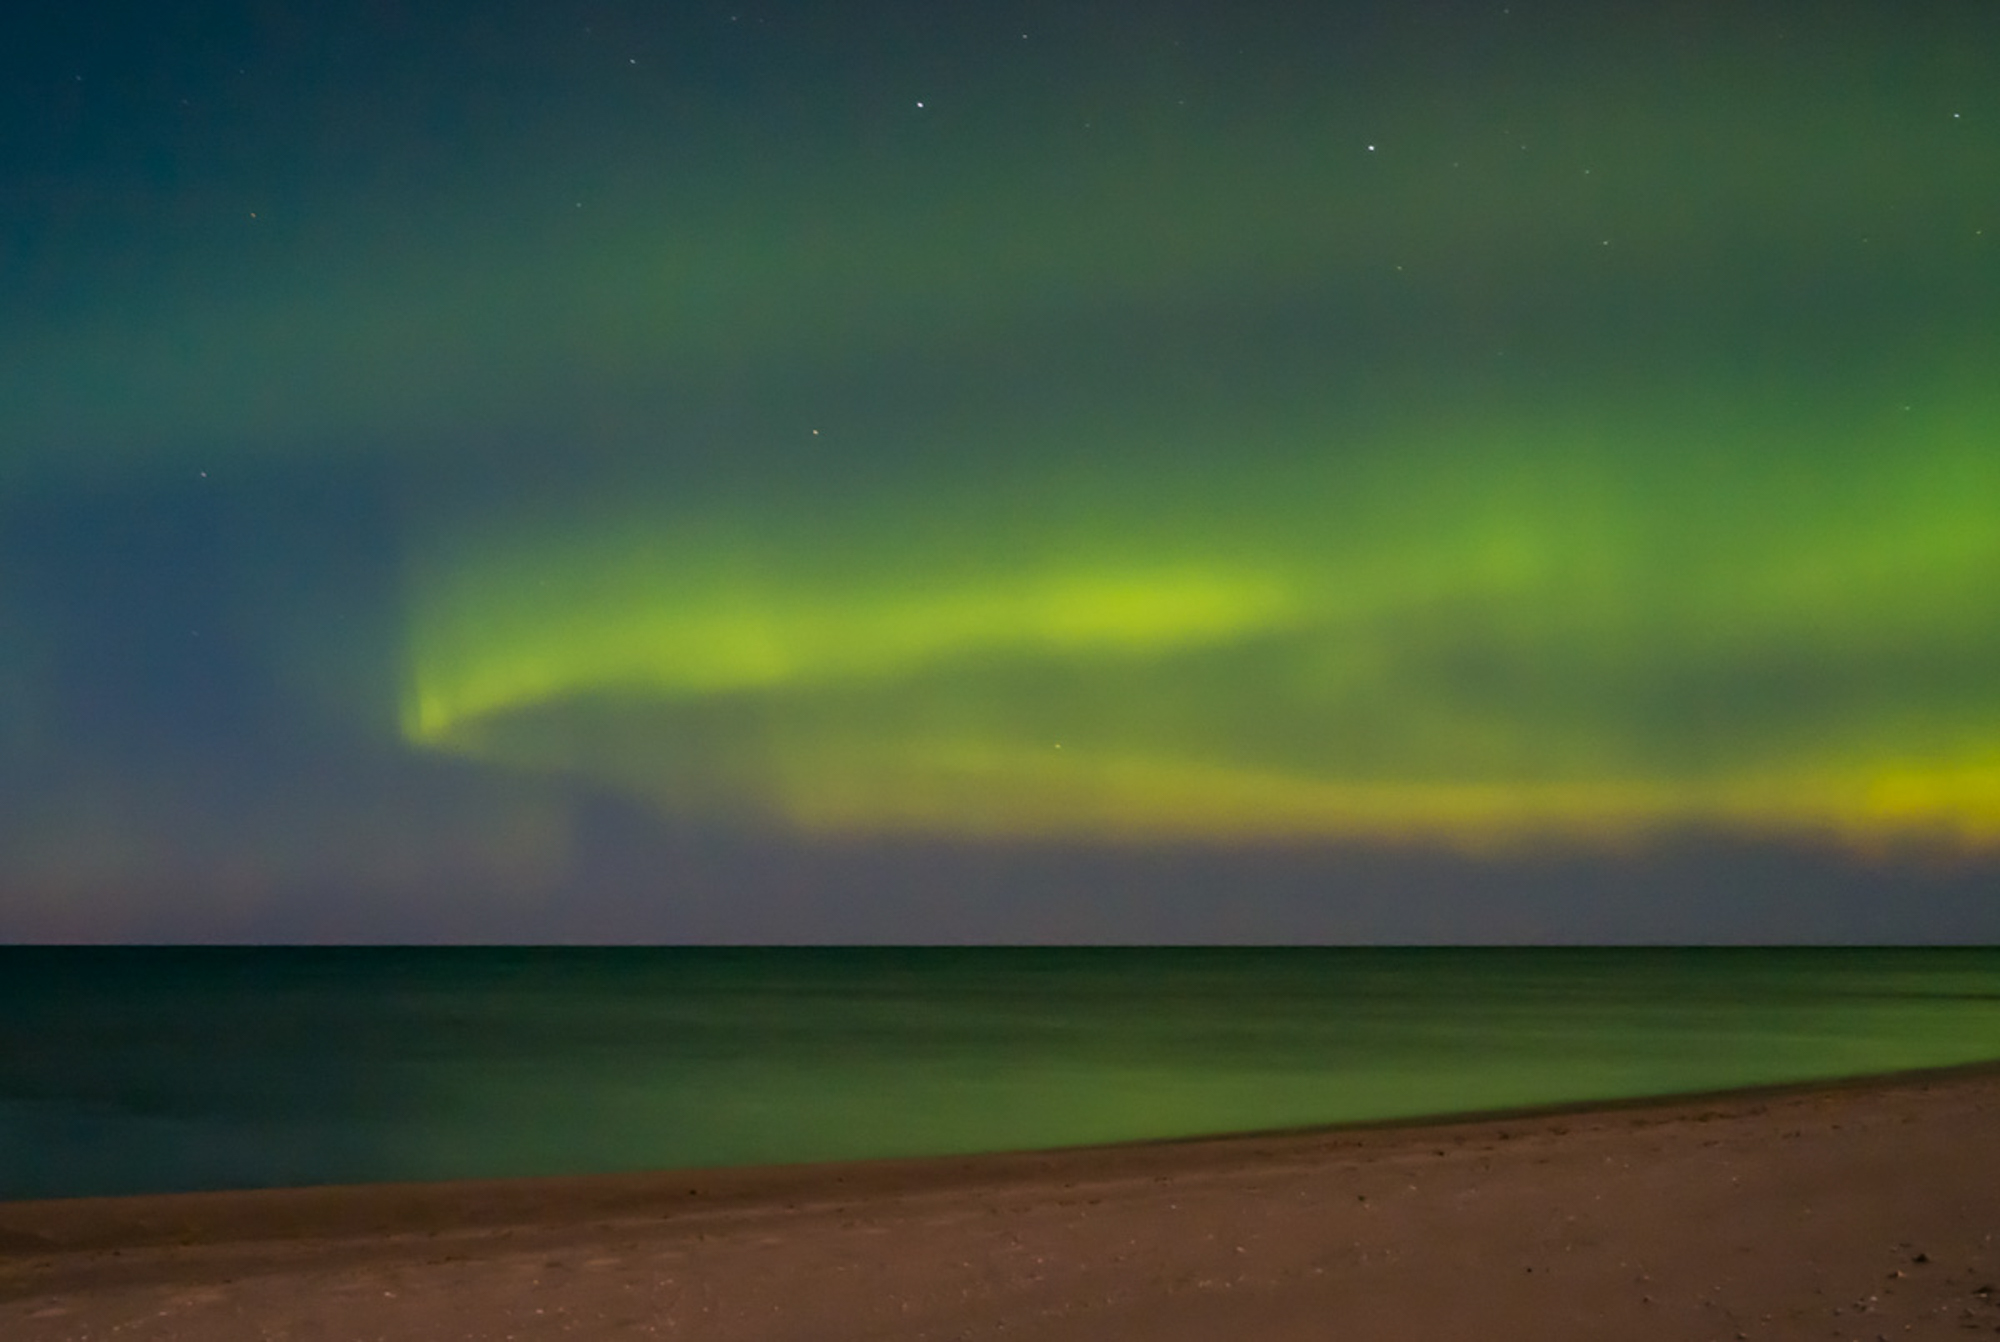 sm_michigan-northern-lights-1200w-20120930-DSCF4556 copy.jpg